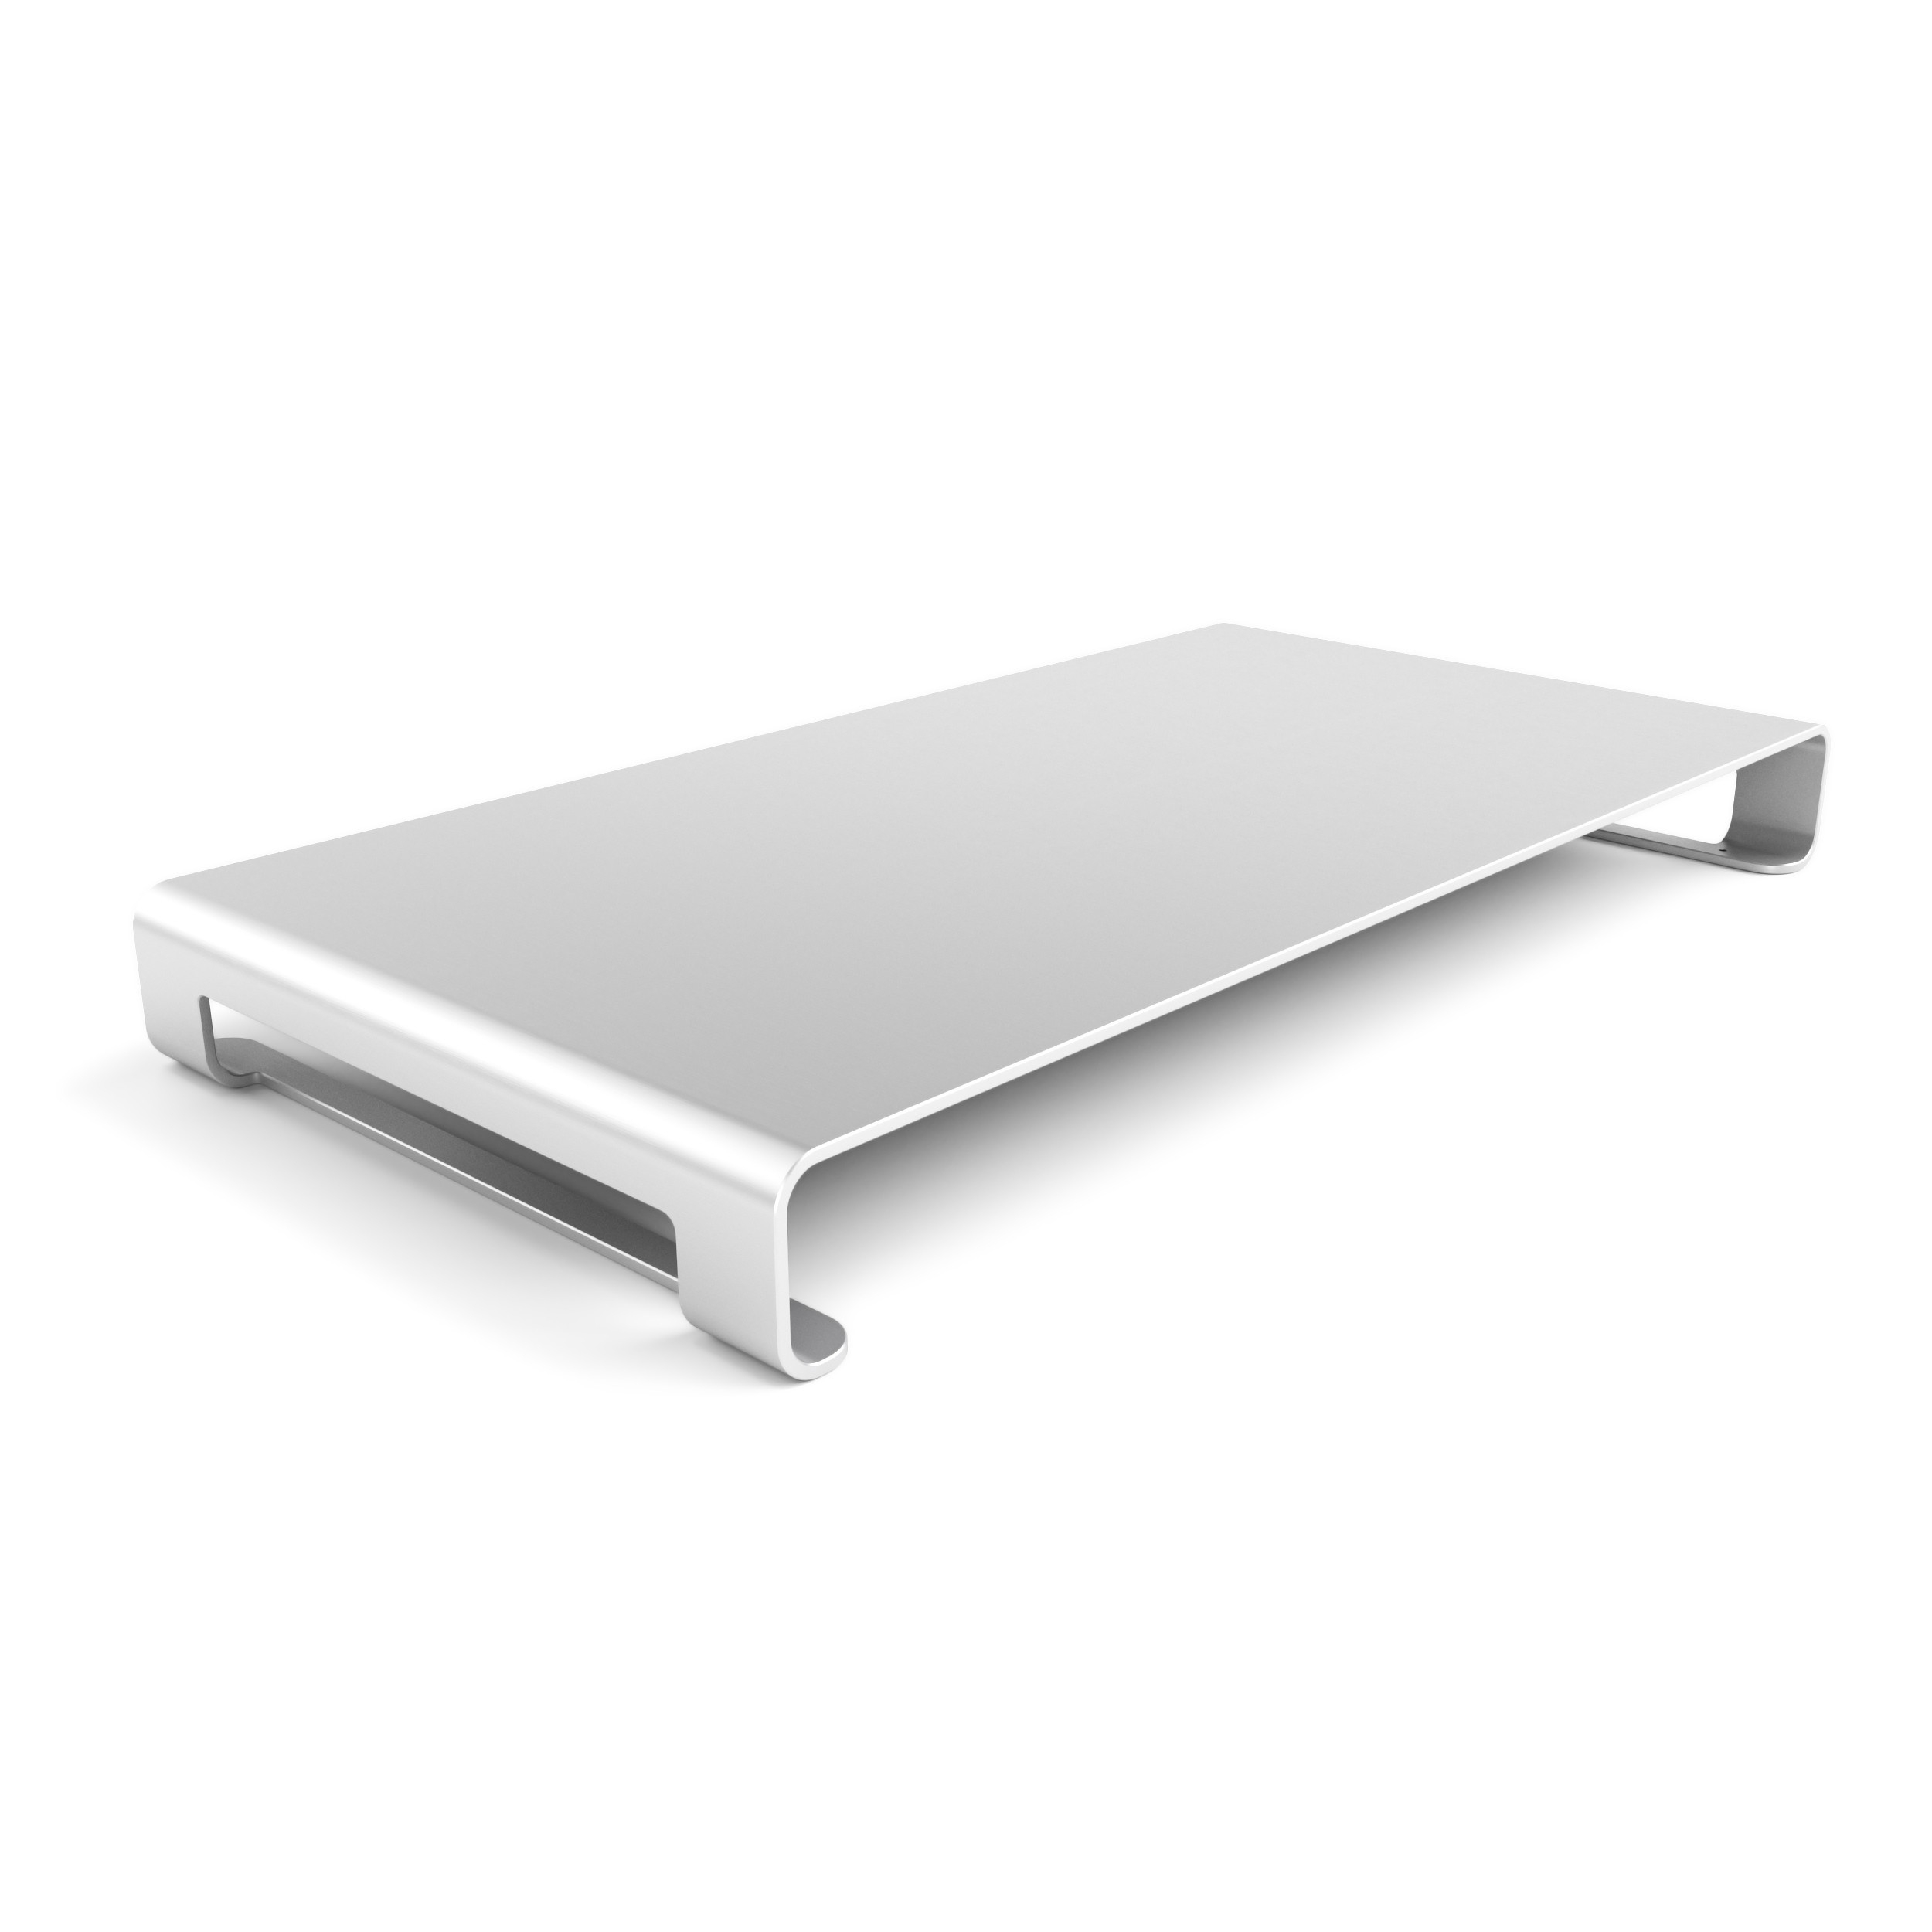 Алюминиевая подставка для монитора Satechi Aluminum Monitor Stand (B019PJOHKA) Серебристый